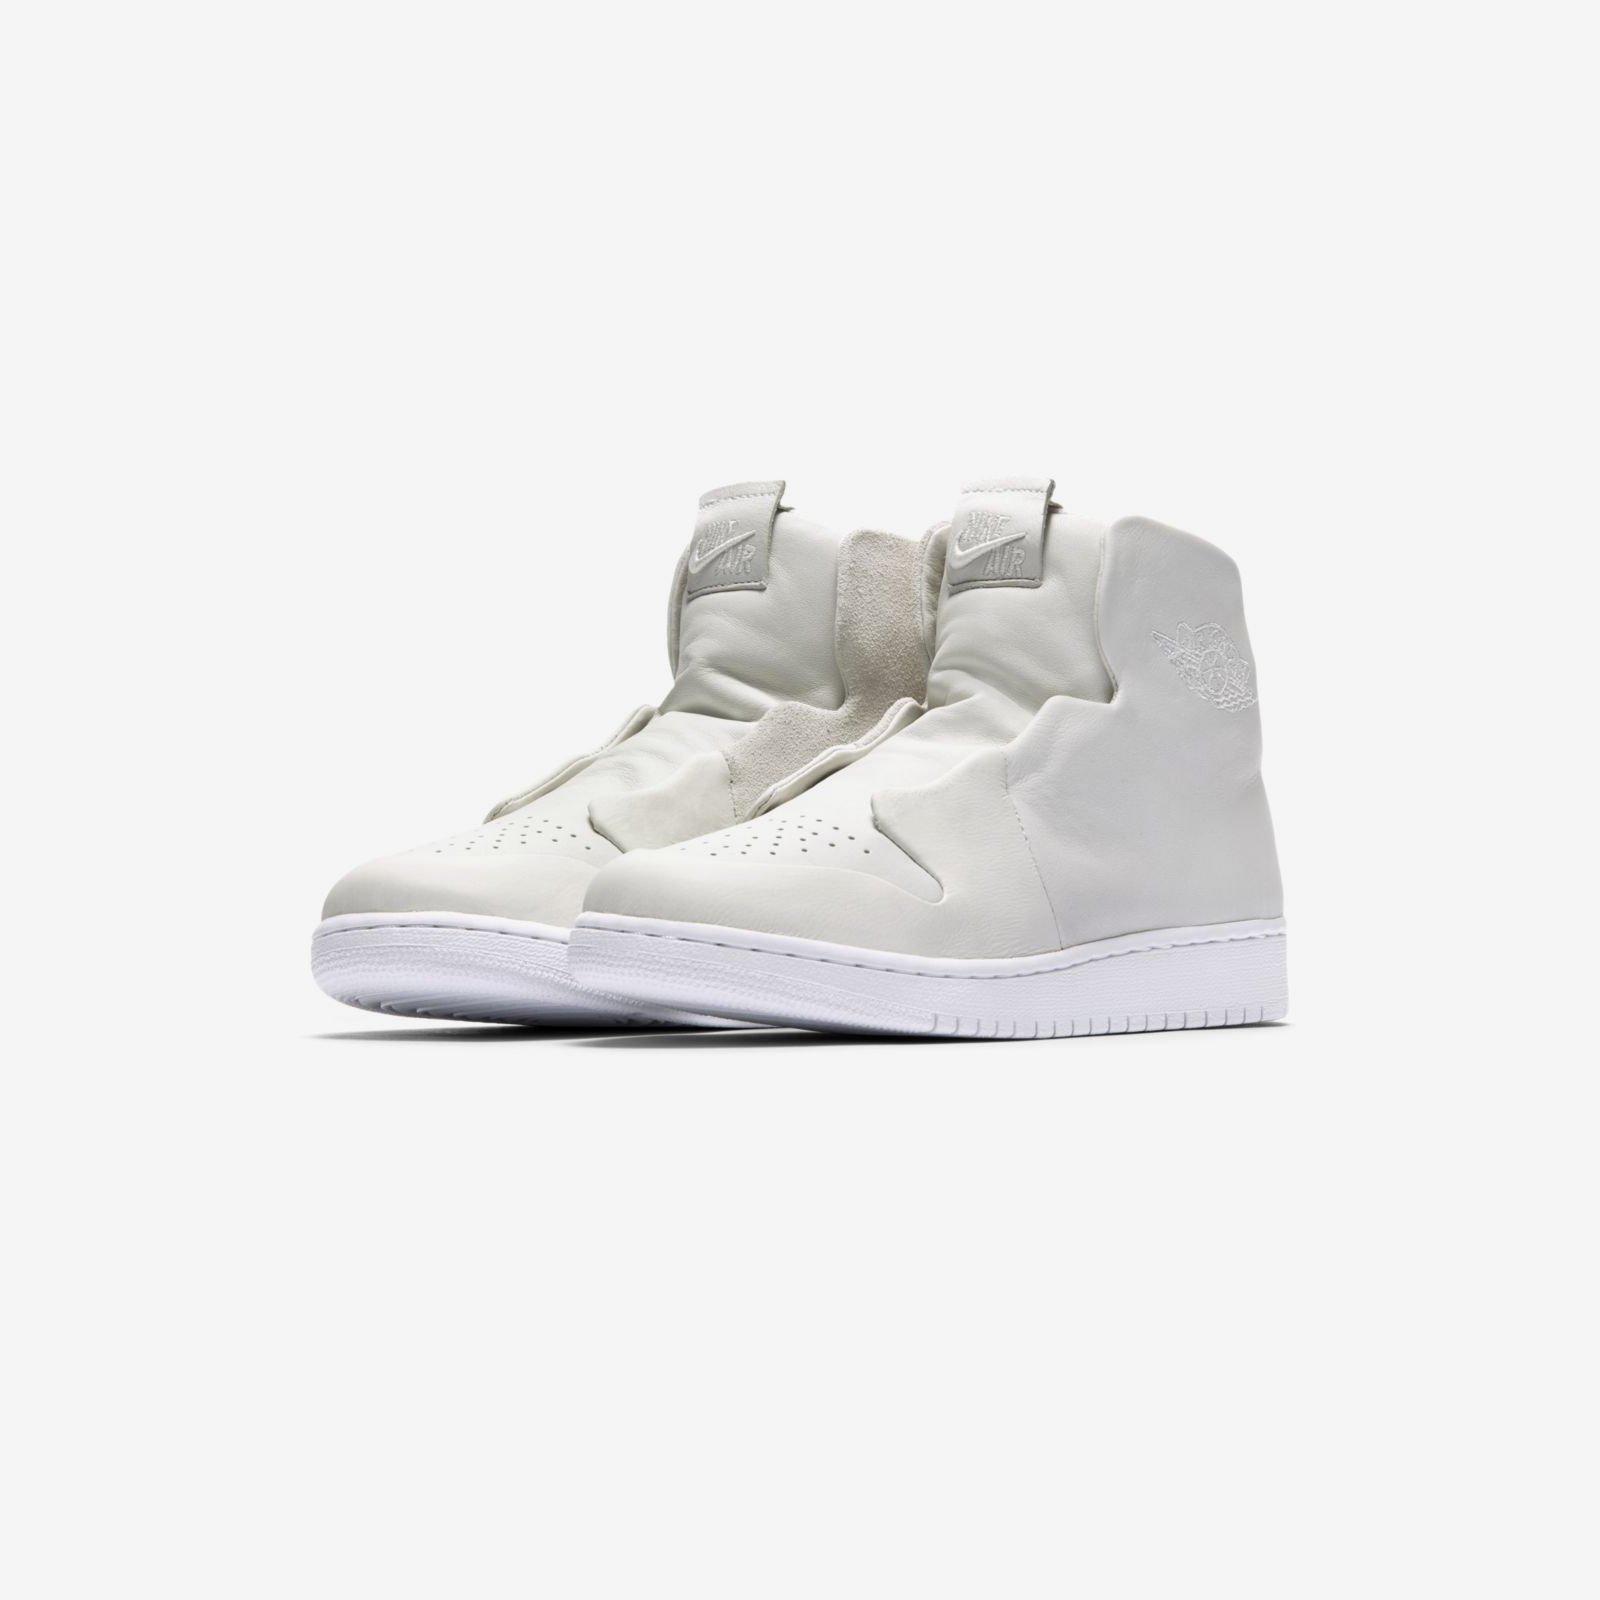 buy popular 162ac ef86b Jordan Brand Air Jordan 1 Sage XX THE 1, REIMAGINED